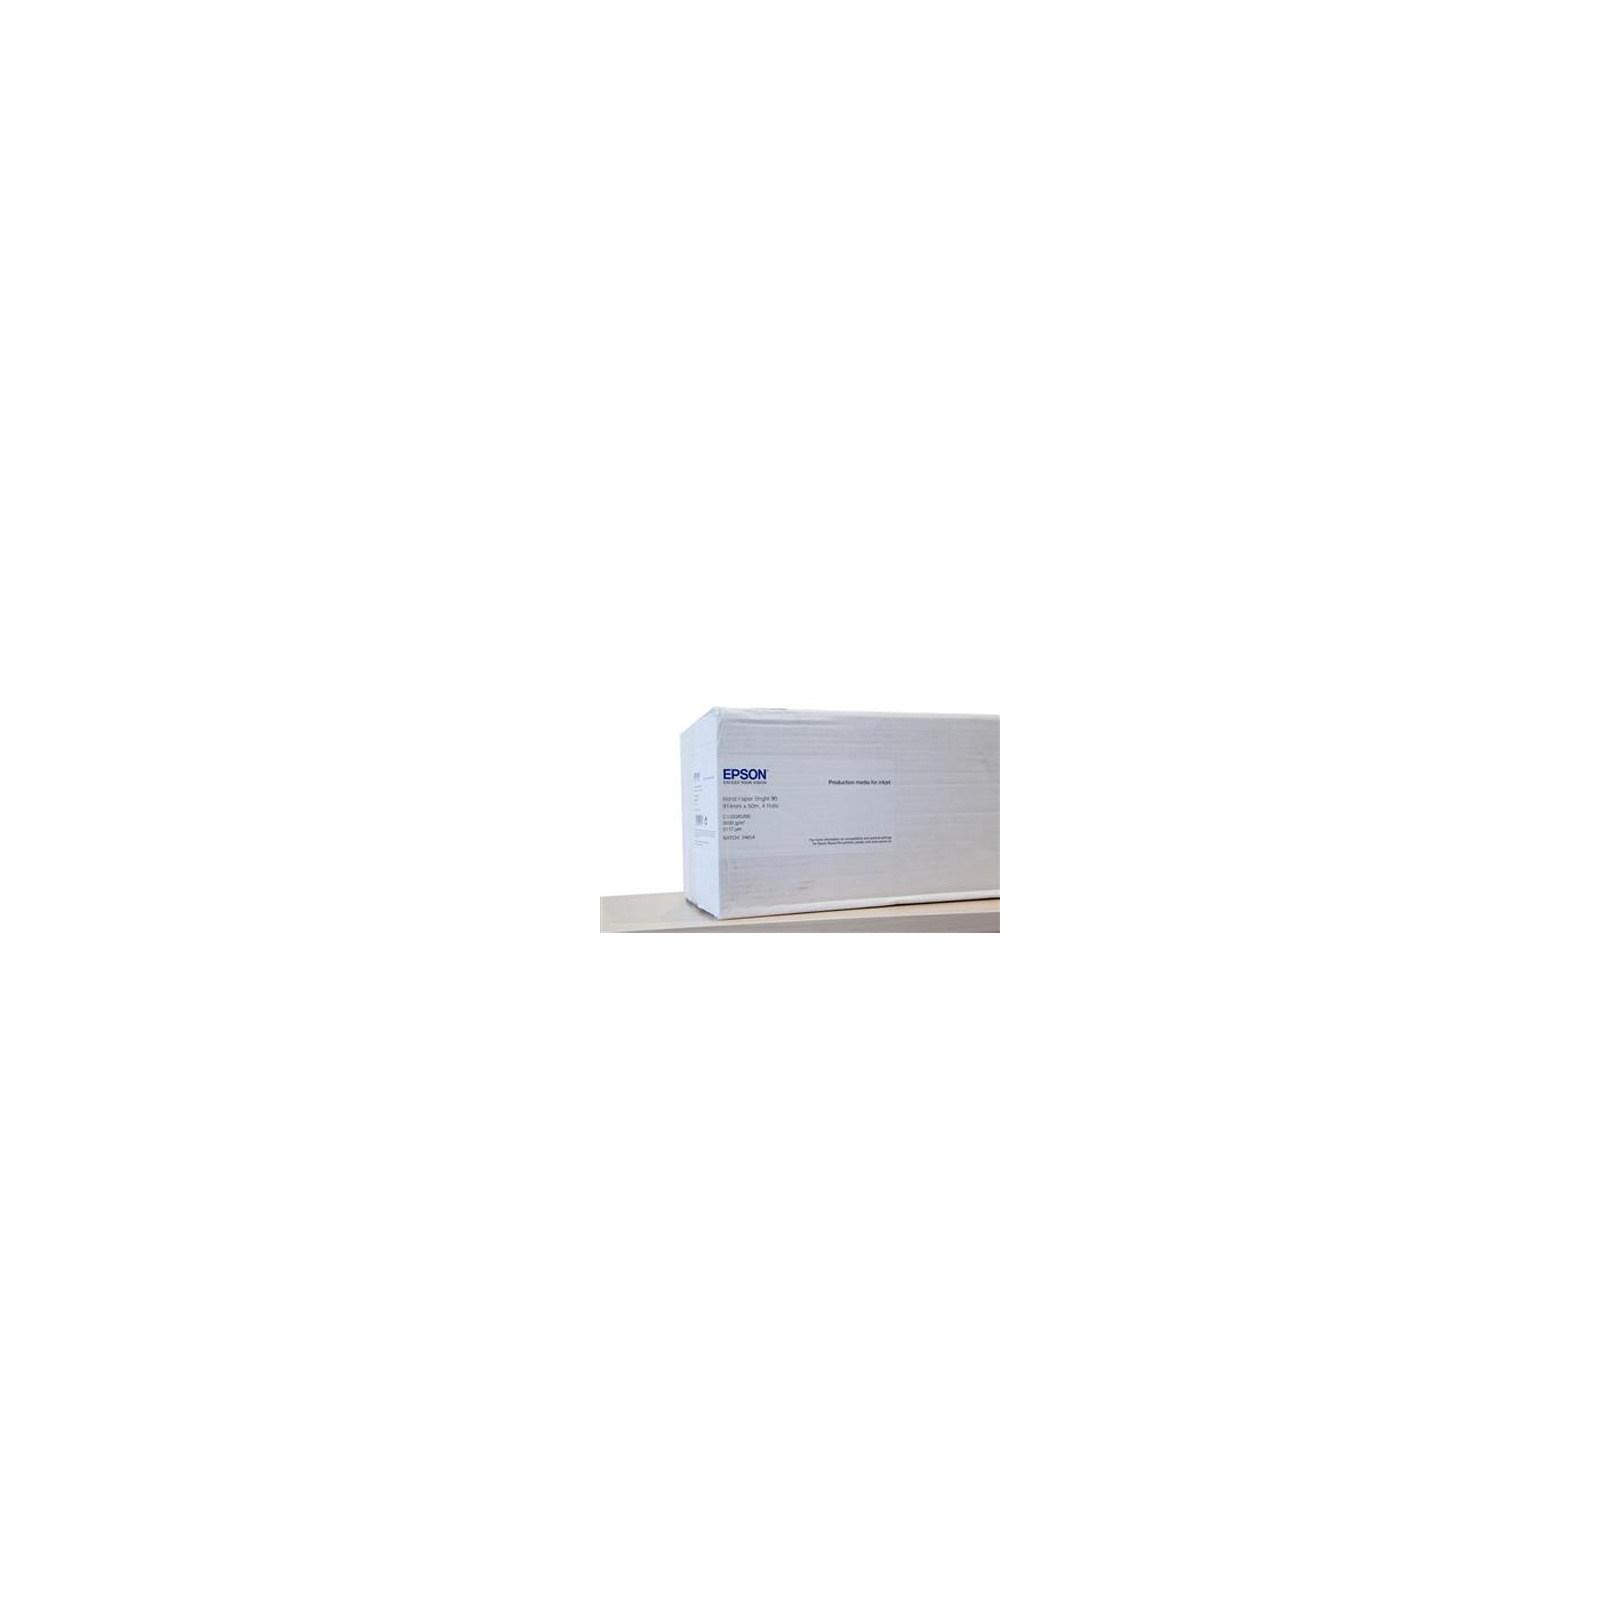 "Бумага EPSON 36"" Bond Paper White (C13S045275)"